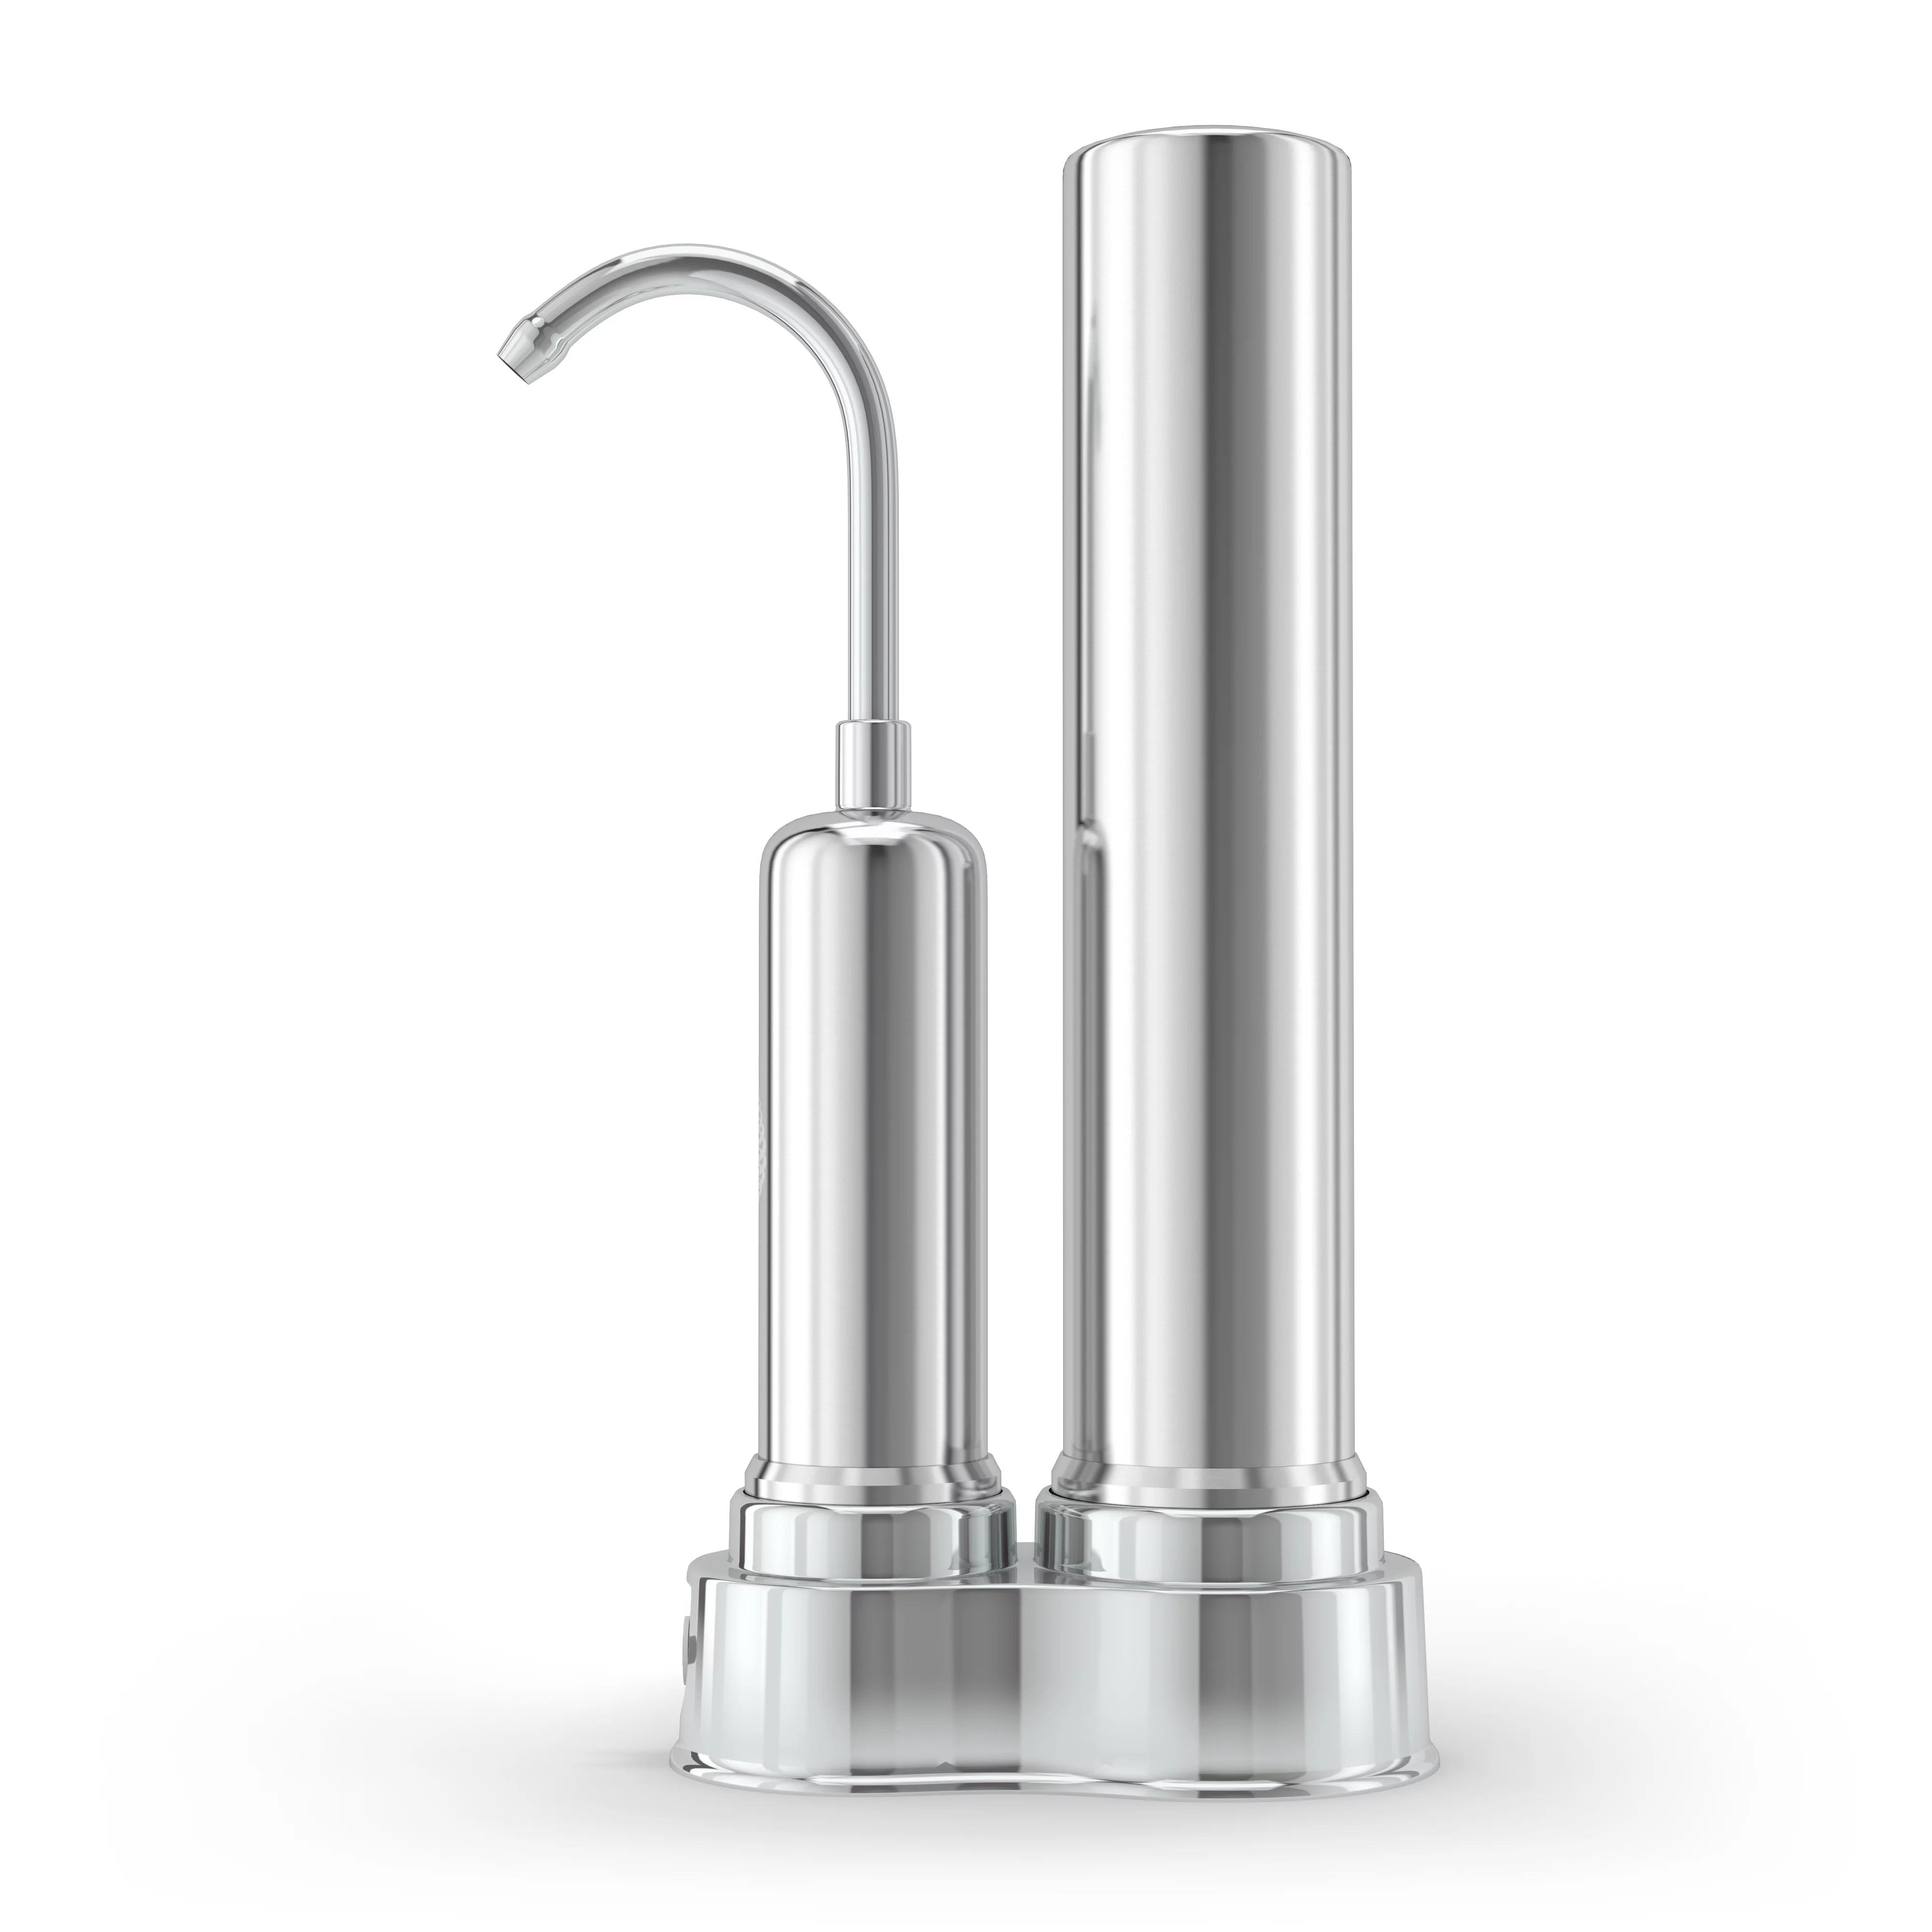 ph regenerate faucet water filter purifier high ph alkaline water filter system home kitchen tap bathroom sink easy installation huge filter